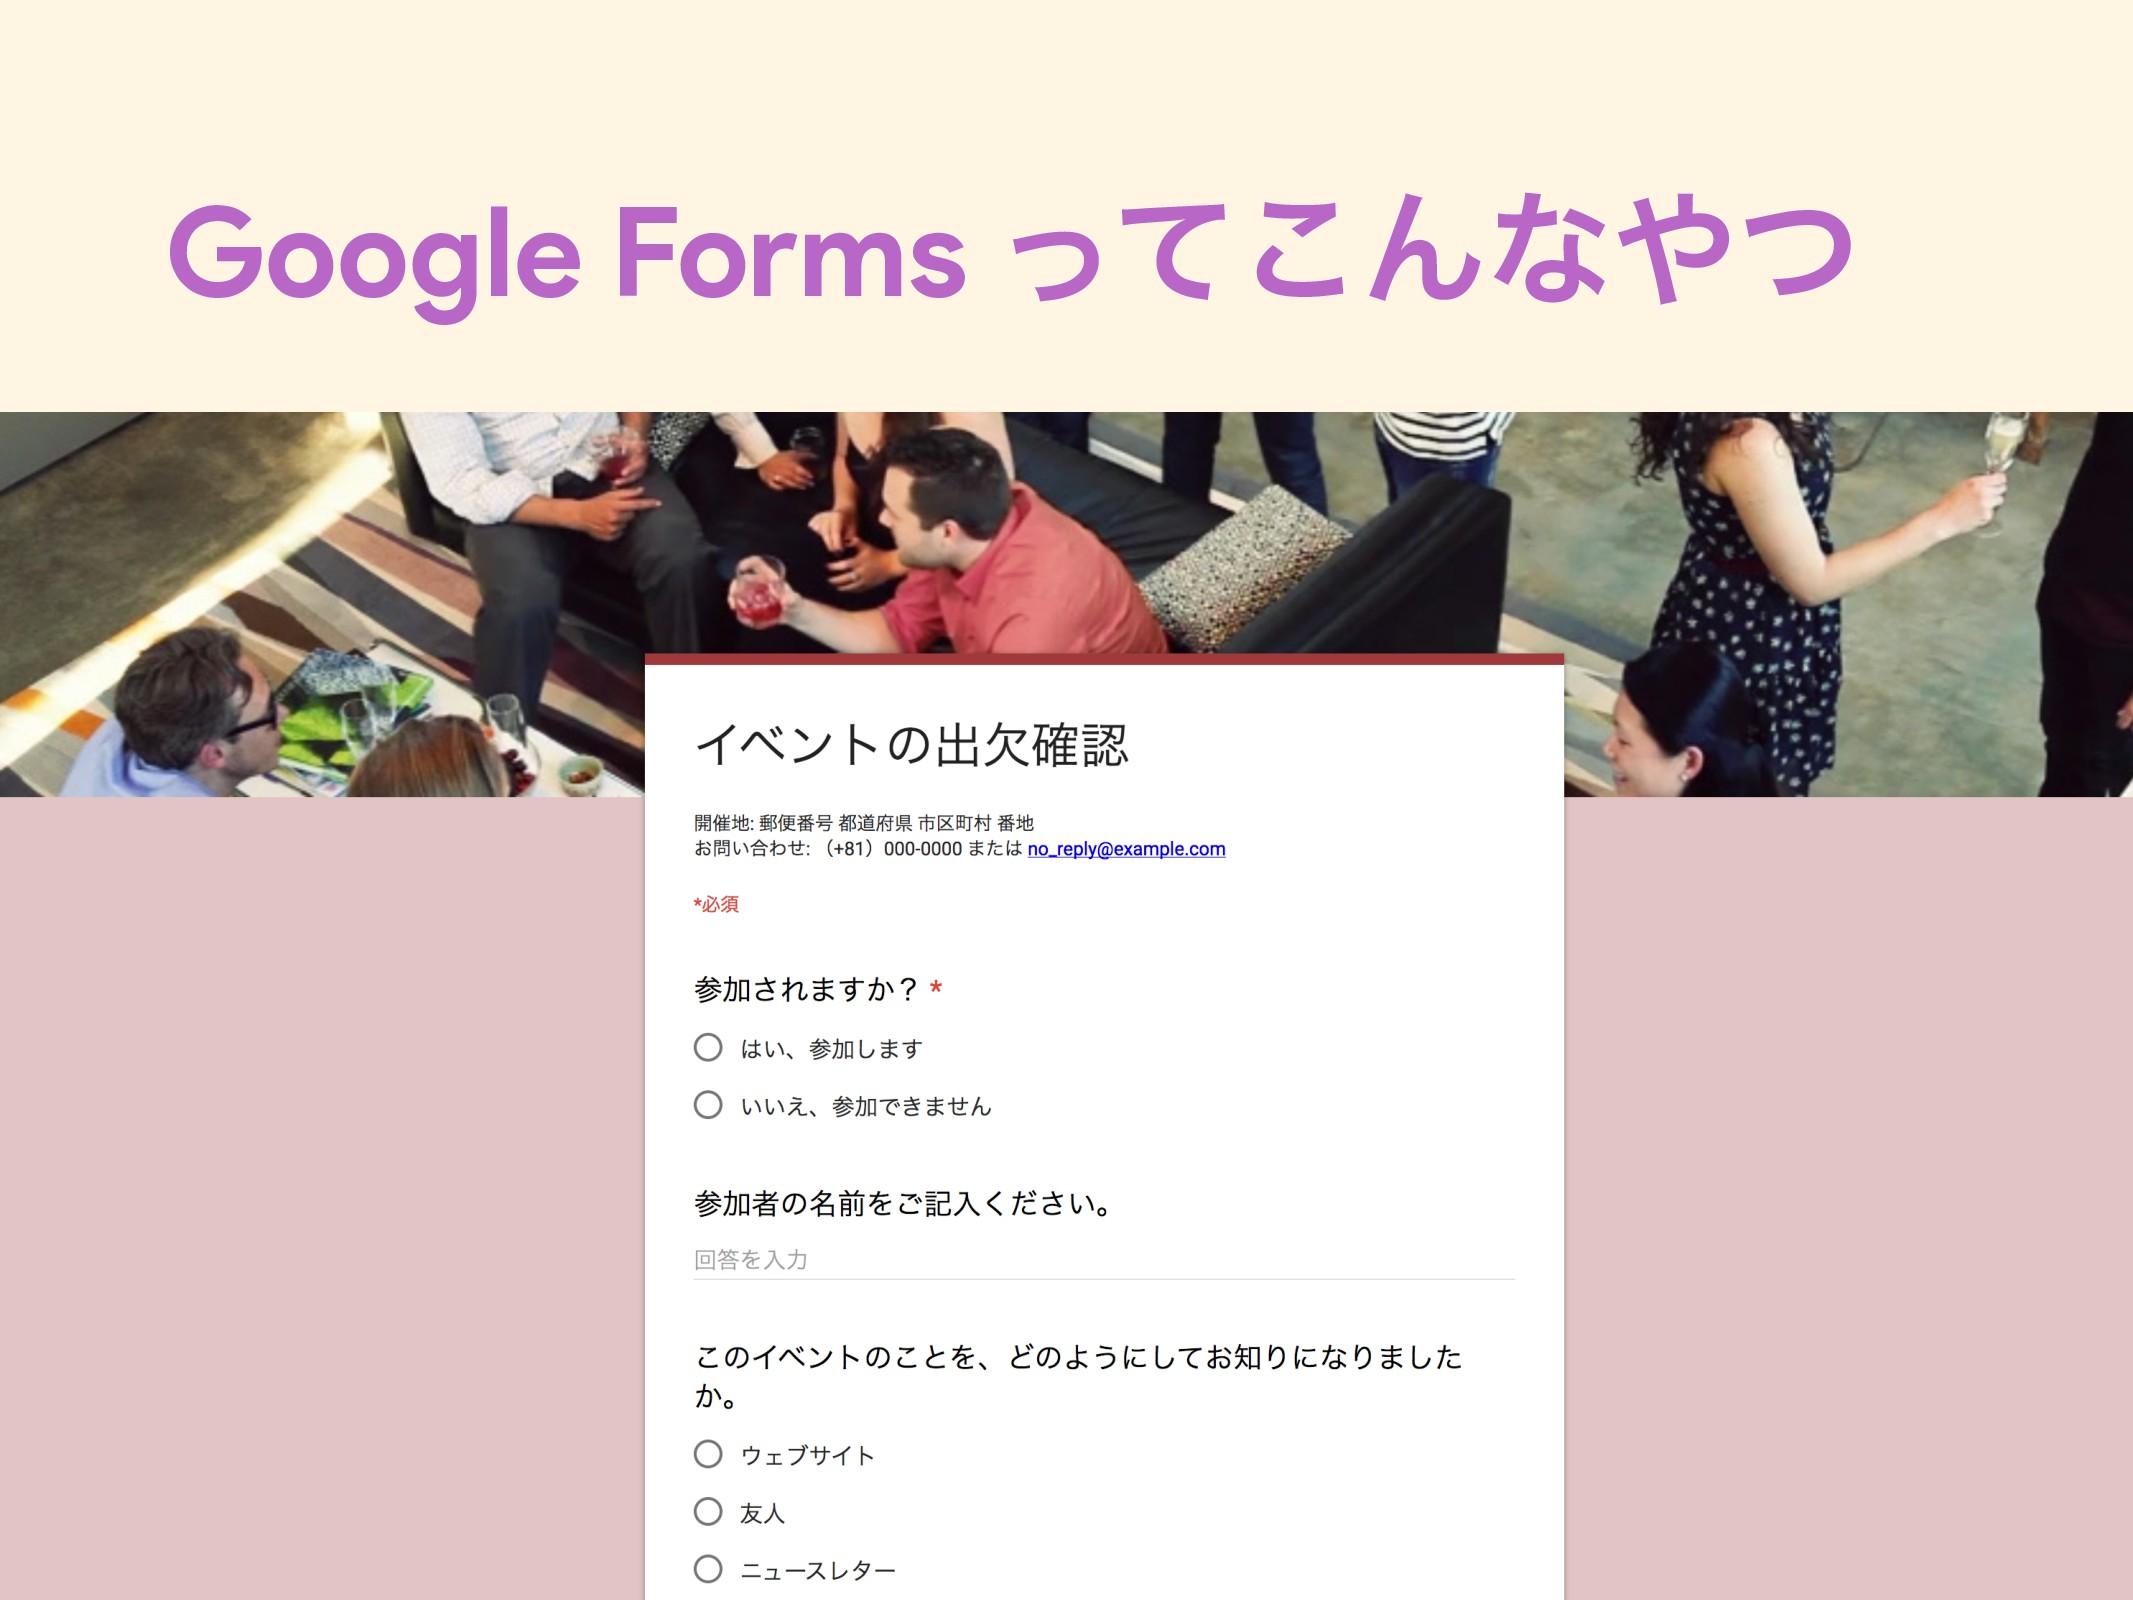 Google Forms ͬͯ͜Μͳͭ